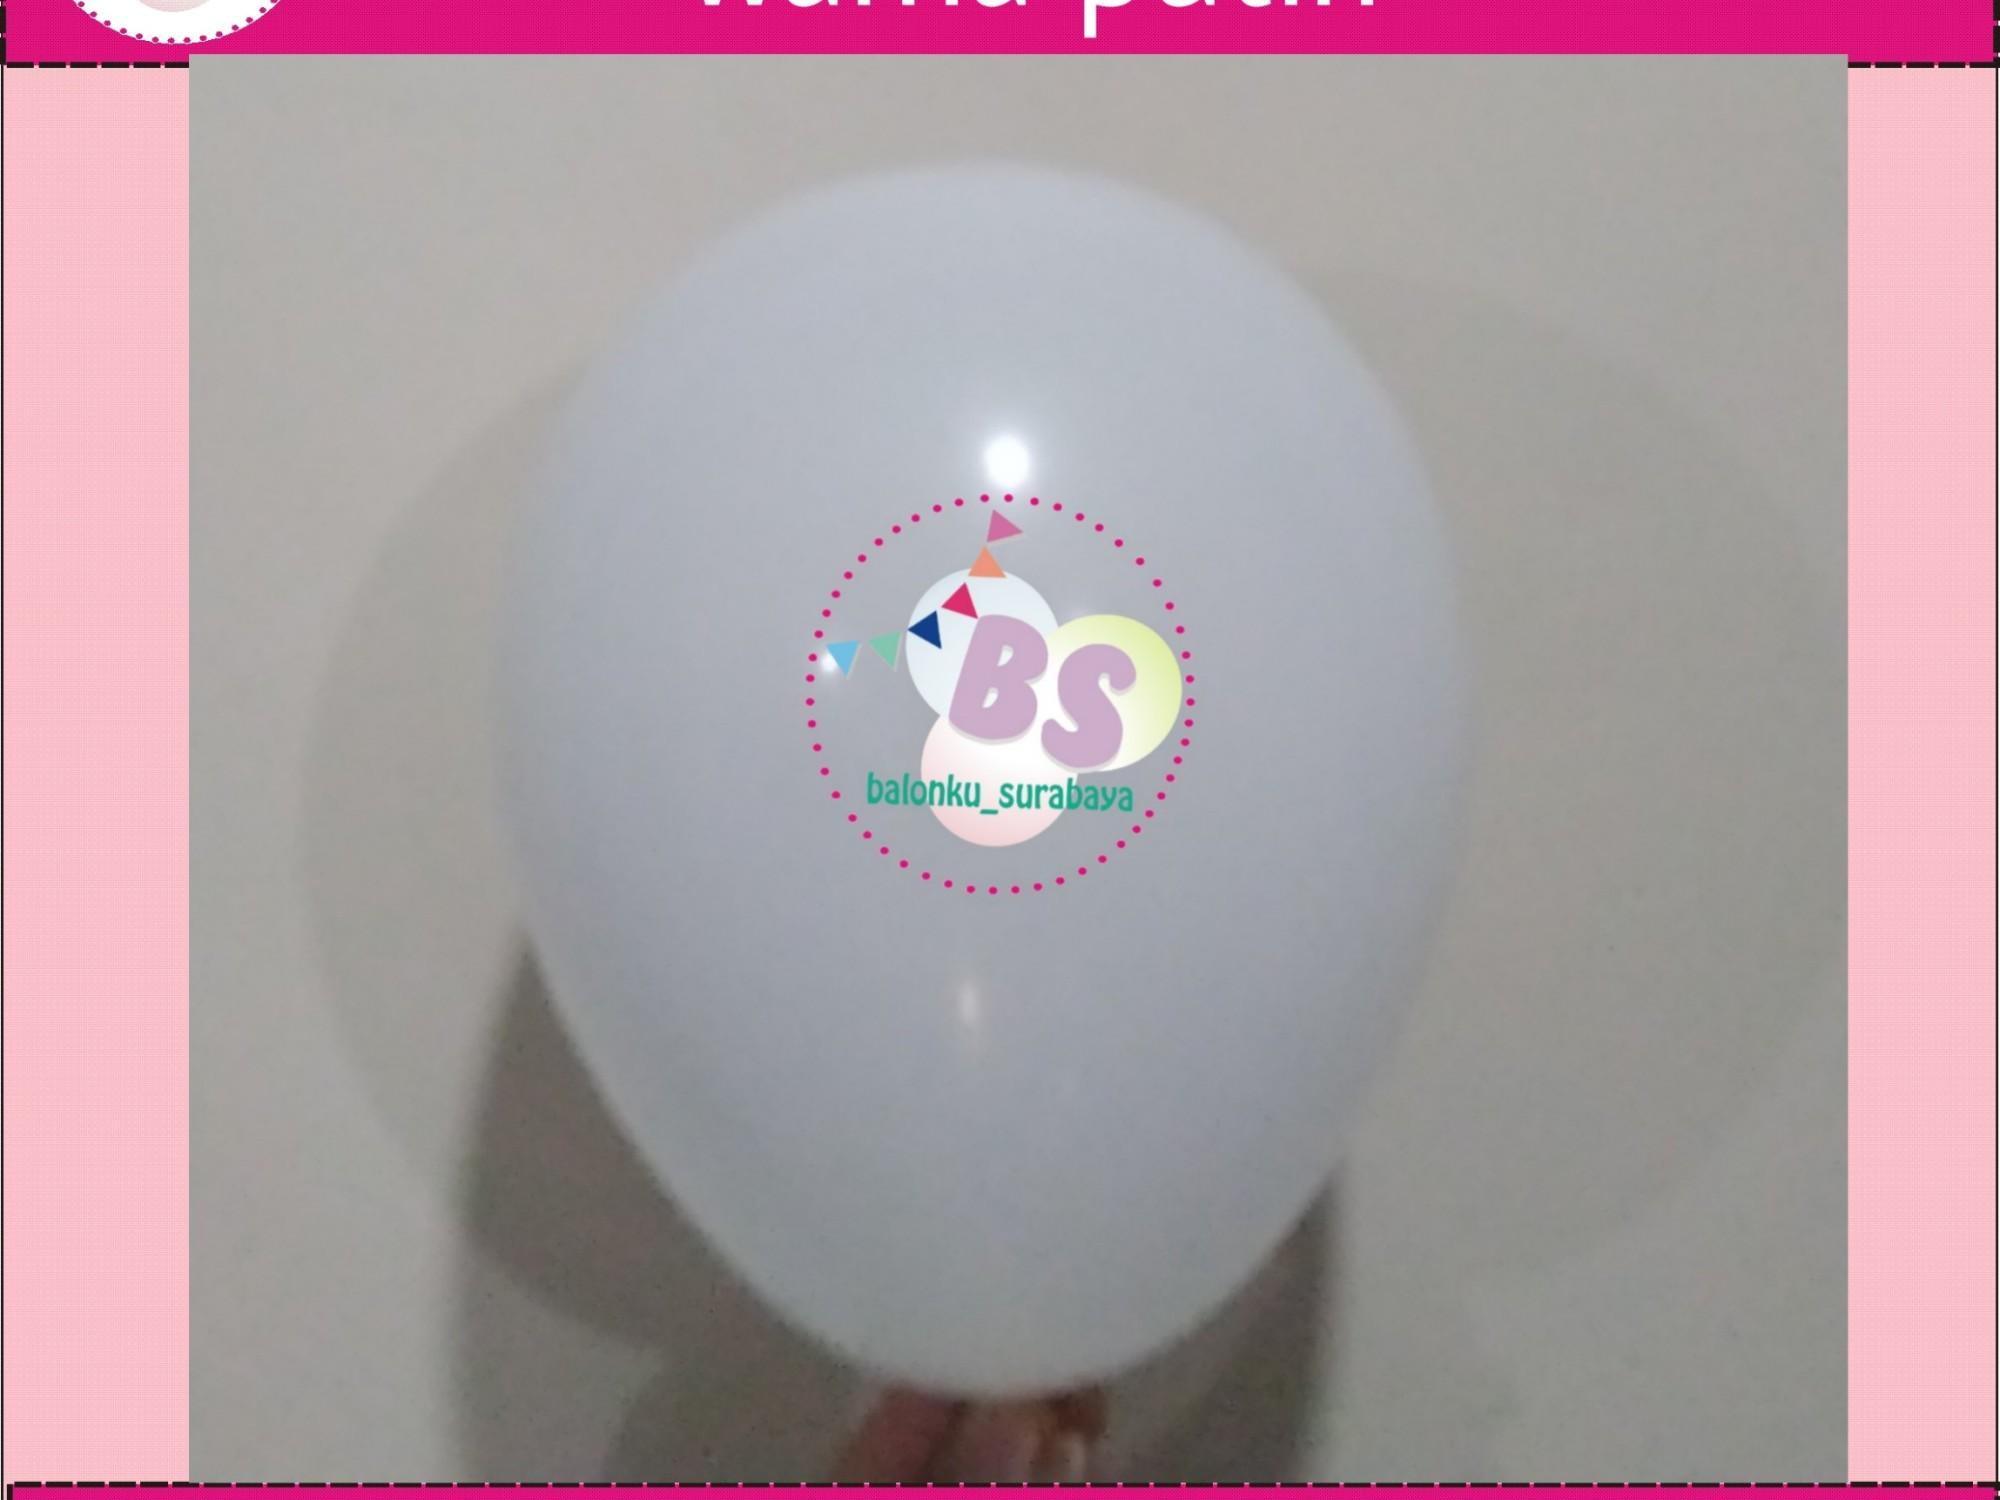 jual balon latex 5 inch putih, BAlon Gas,Bunga dekorasi,Rangkaian bunga artificial, Buket bunga, buket bunga mawar, harga buket bunga,Balon sablon, balon Printing, balon promosi, , Perlengkapan ulang tahun, Balon latex , balon doff, balon latex, balon doff merah, balon natal, balon agustusan, balon dekorasi, balonku Surabaya, 085733133529